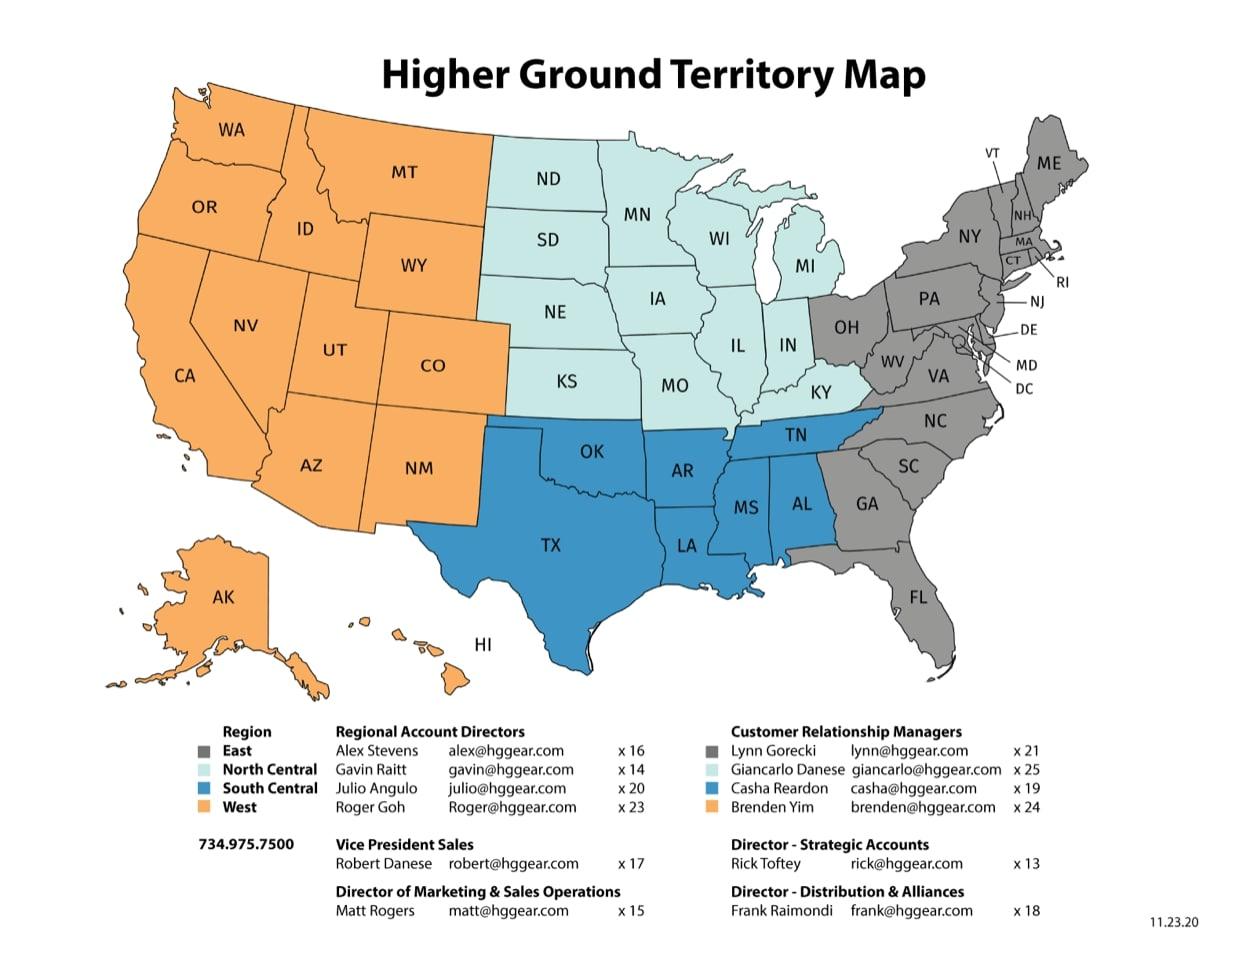 Higher Ground Territory Map